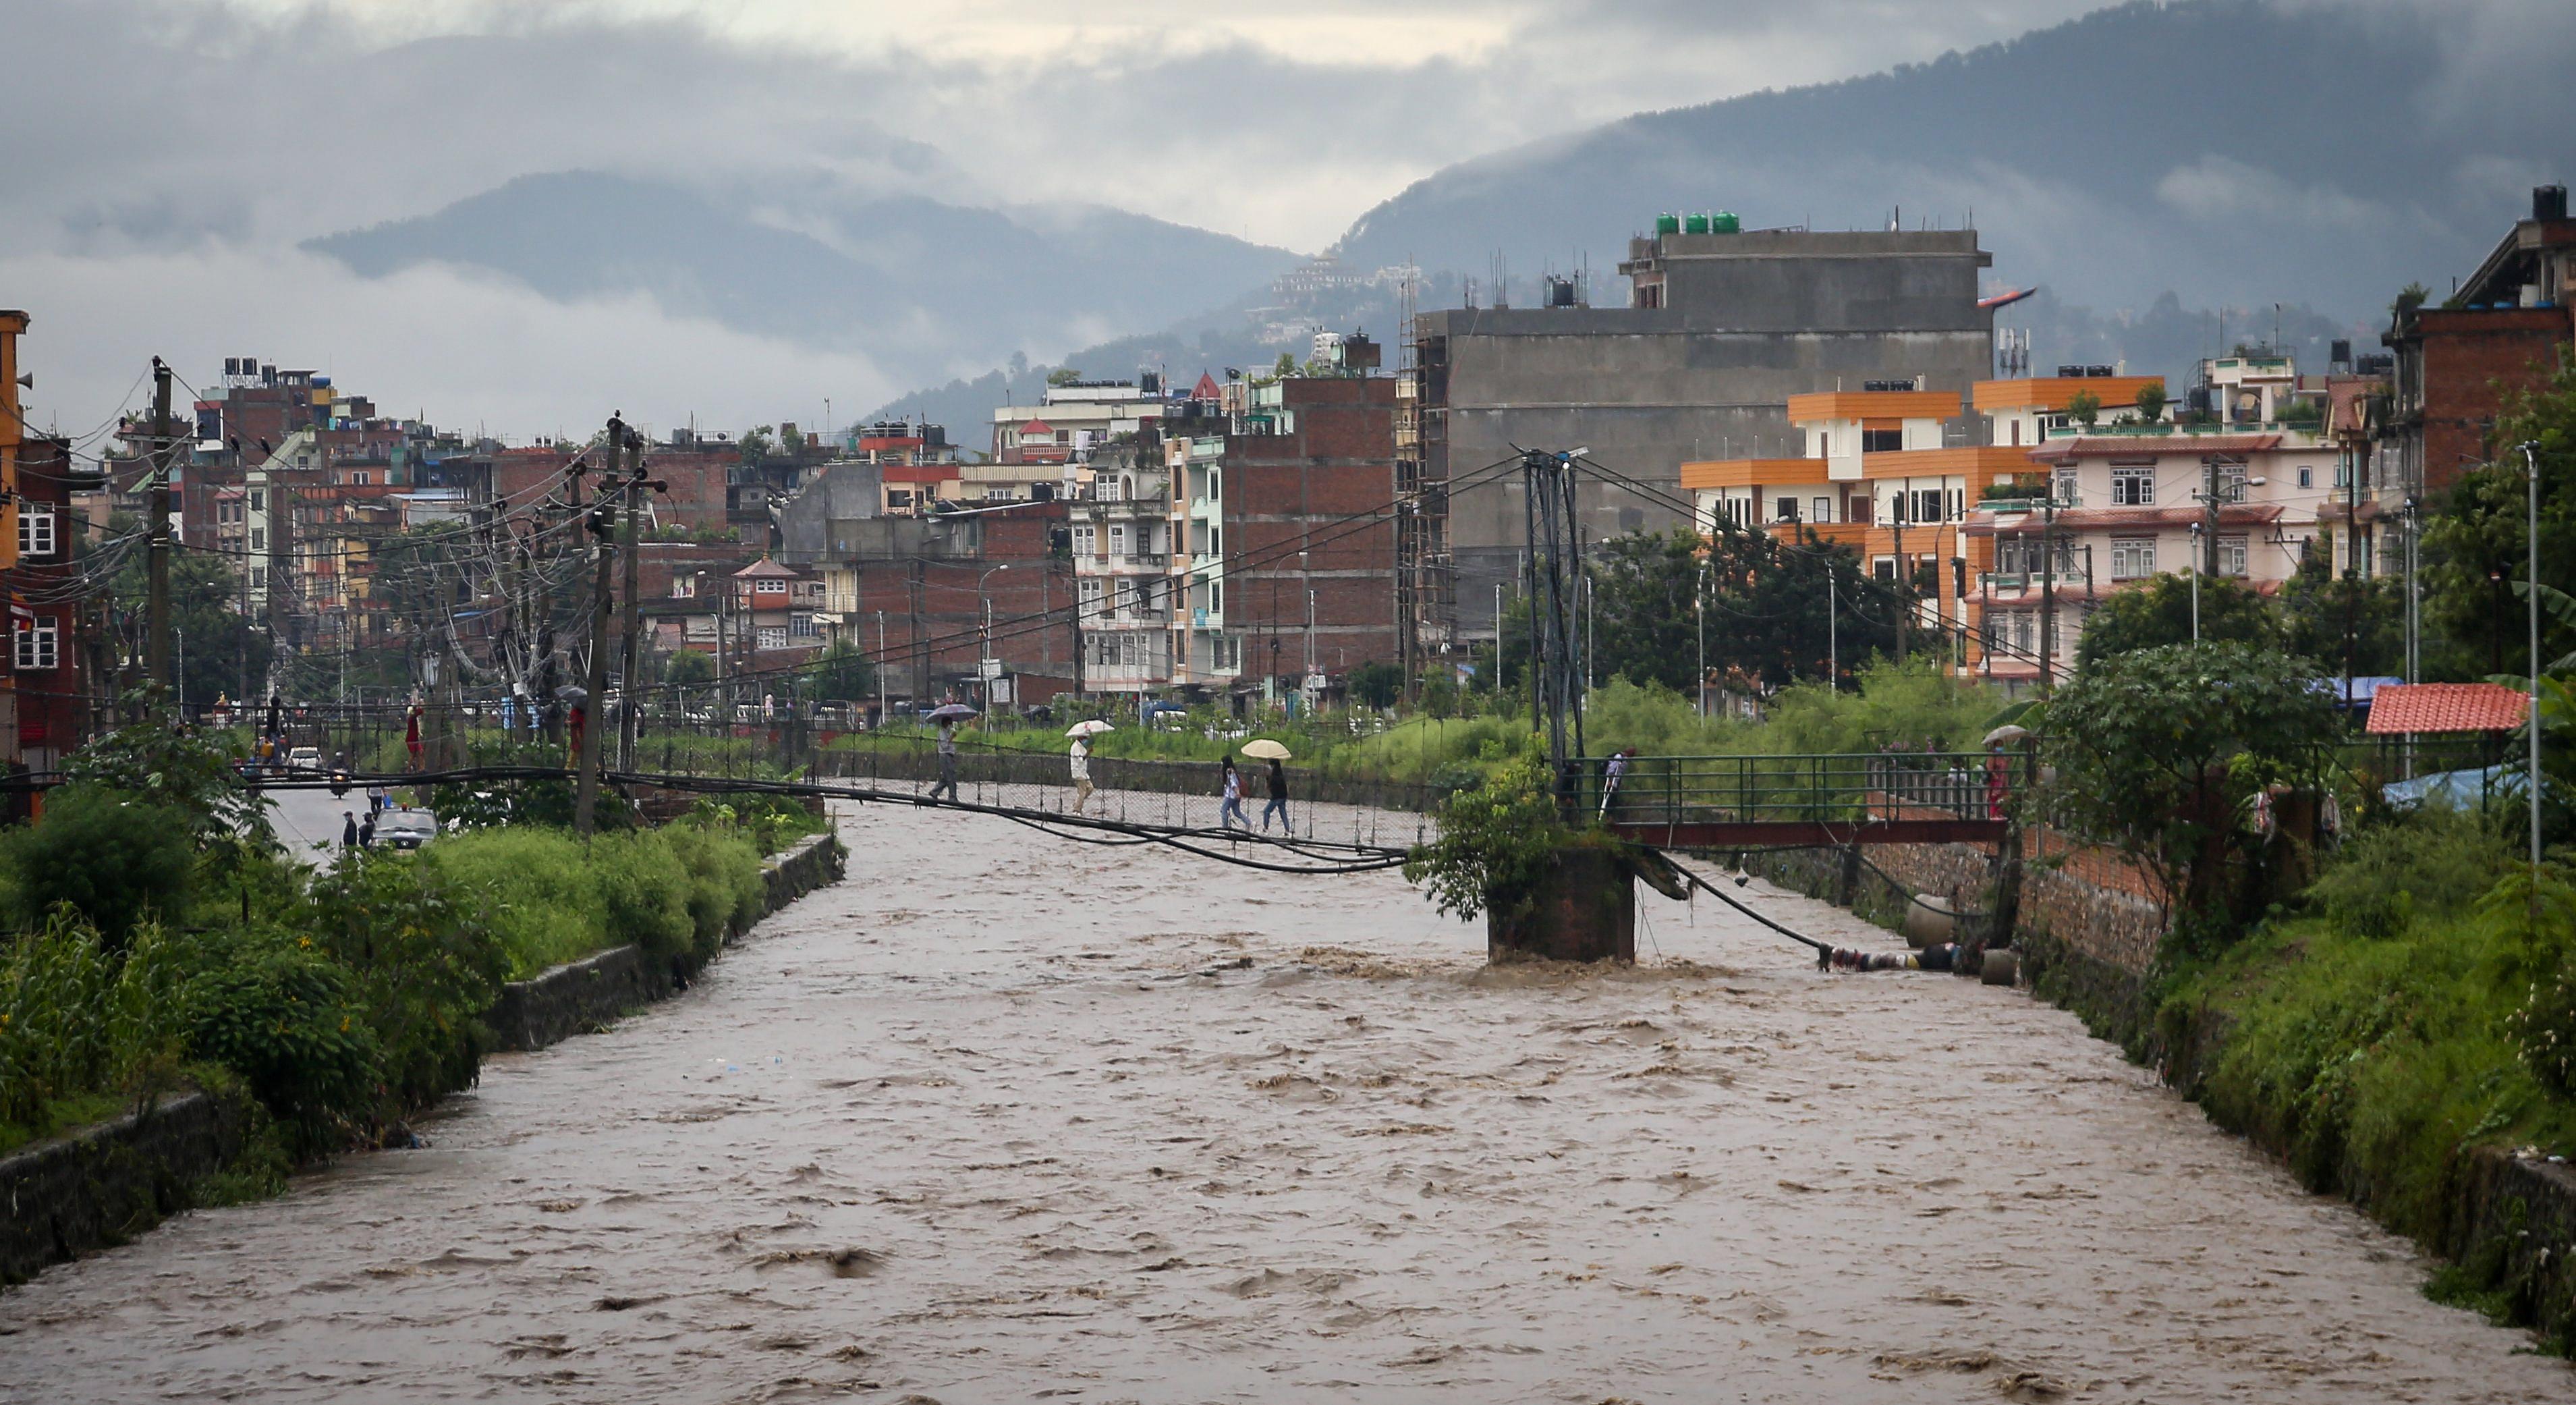 Bishnumati river at Kankeshwari, Kathmandu swells due to continuous rainfall, as seen on Tuesday, August 18, 2020. Photo: Naresh Shrestha/THT